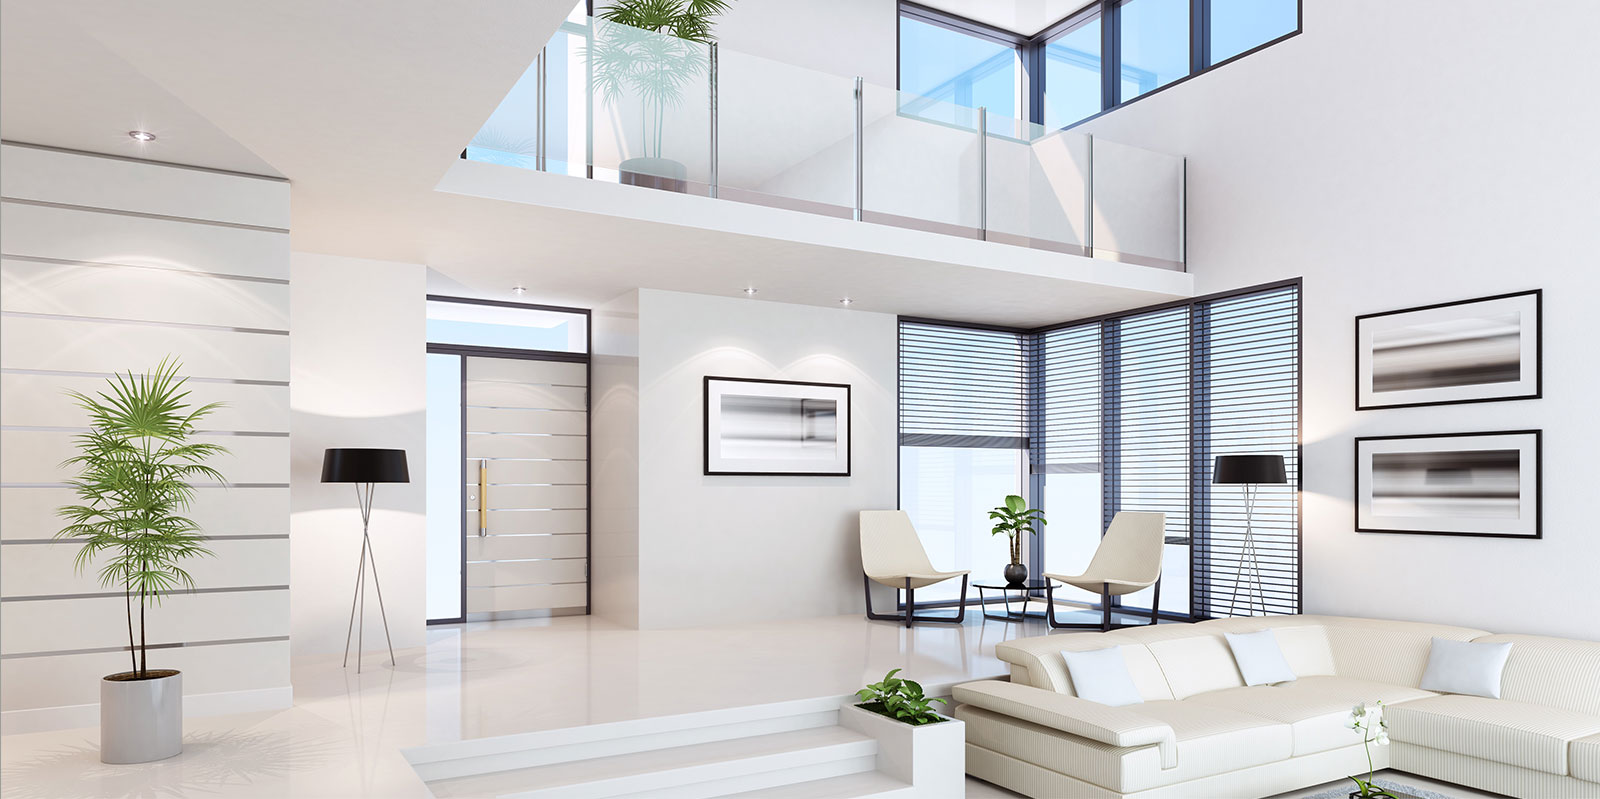 Living Area Interior | Peggy Dearing, Realtor